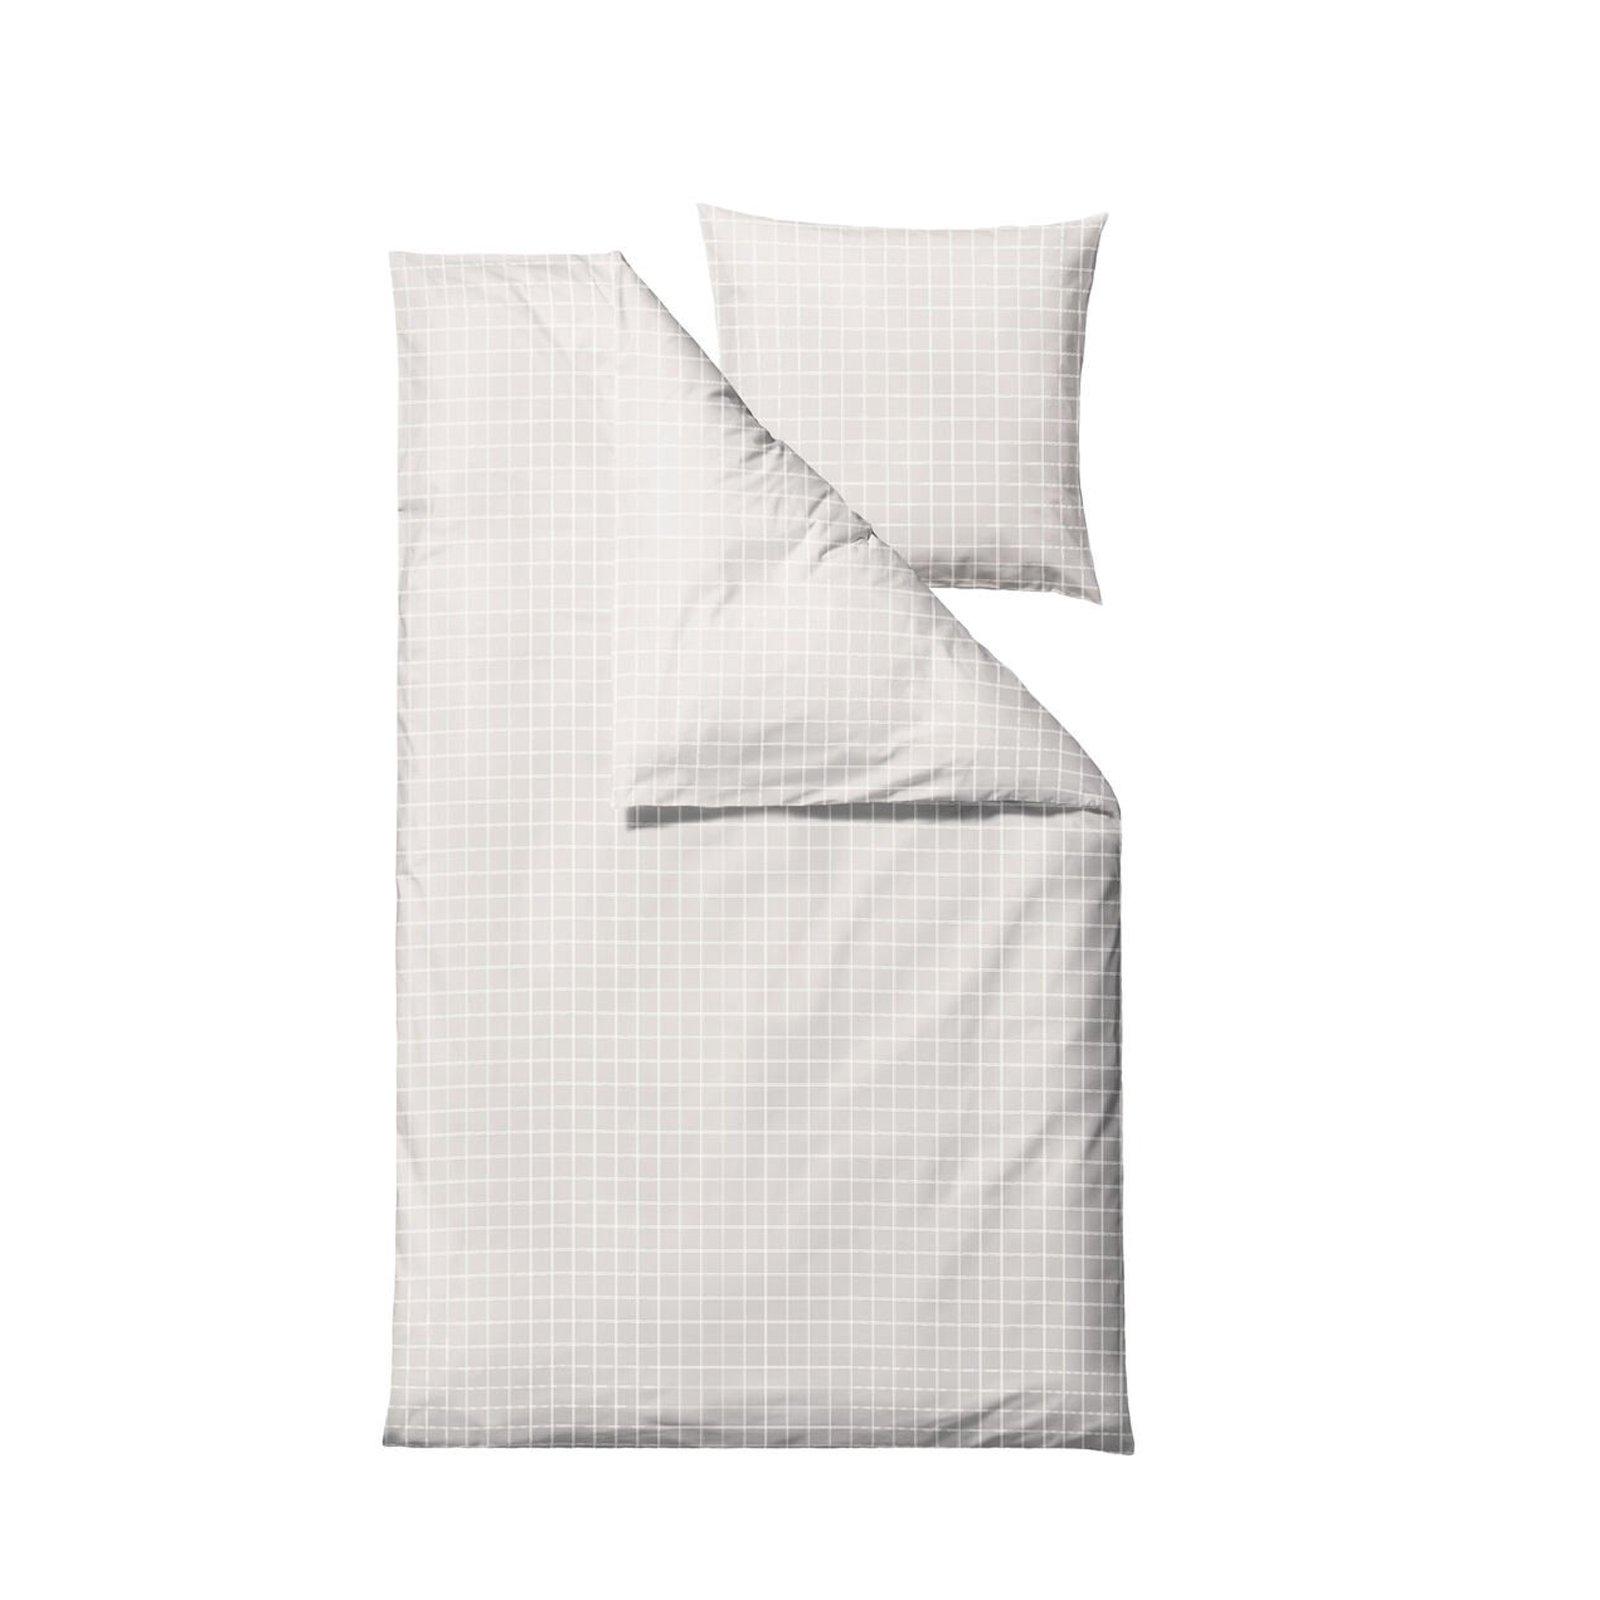 Södahl - Clear Bedding Sets 140 x 200 cm - White (12028)